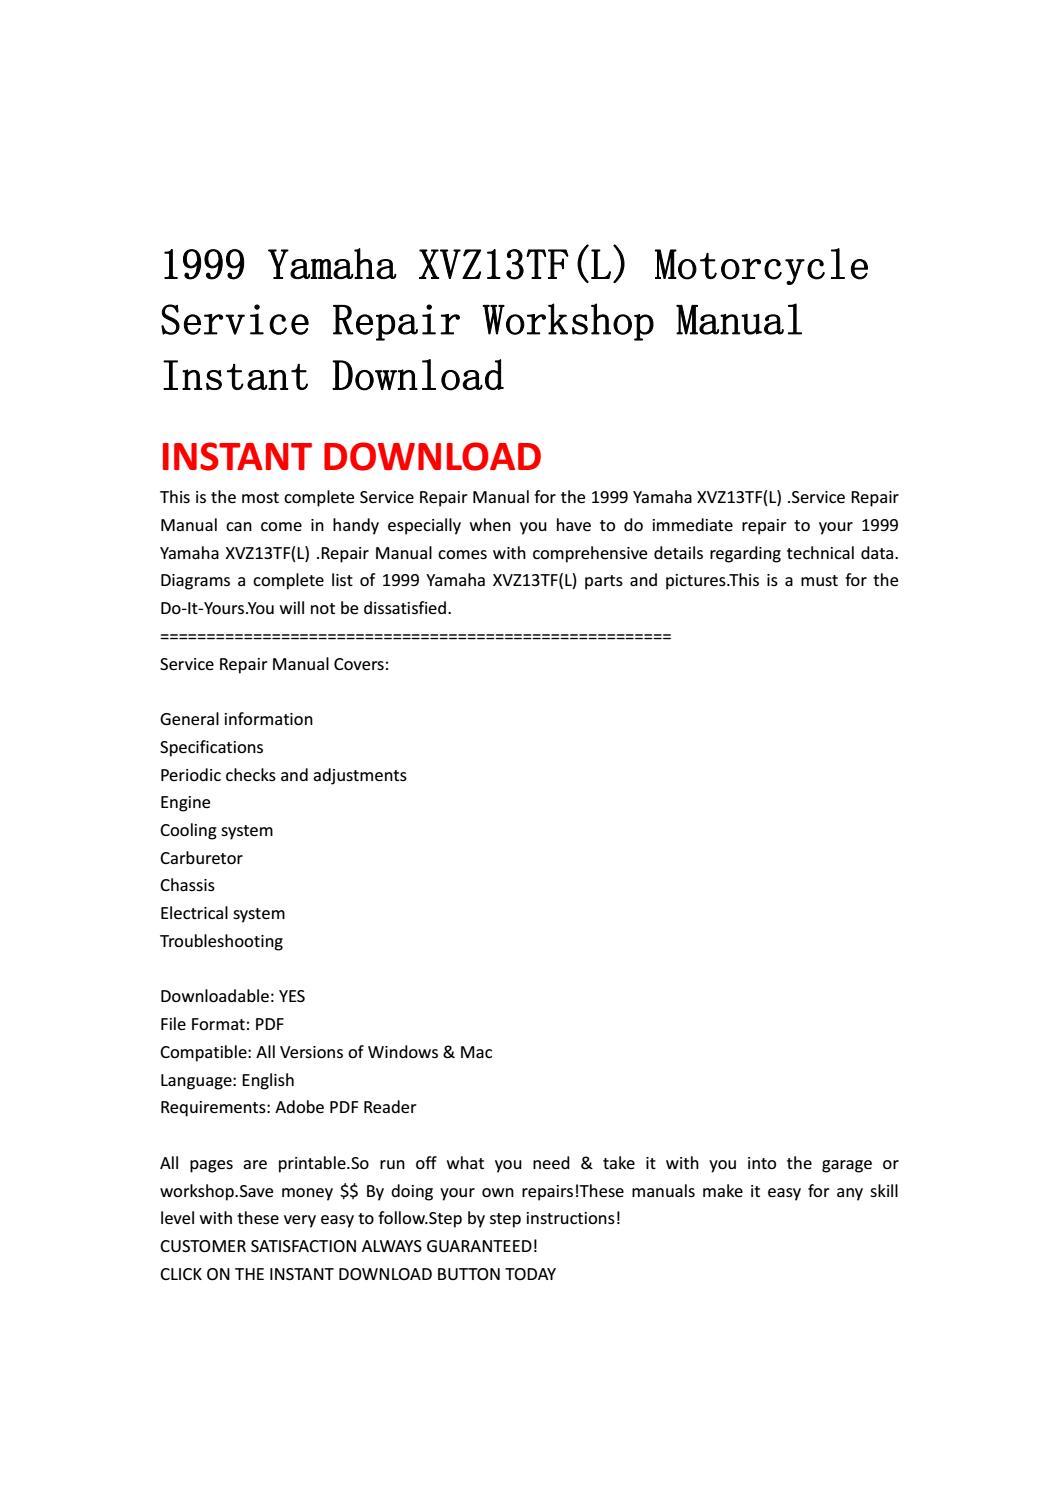 1999 yamaha xvz13tf(l) motorcycle service repair workshop manual instant  download by ksjefnsenfn - issuu